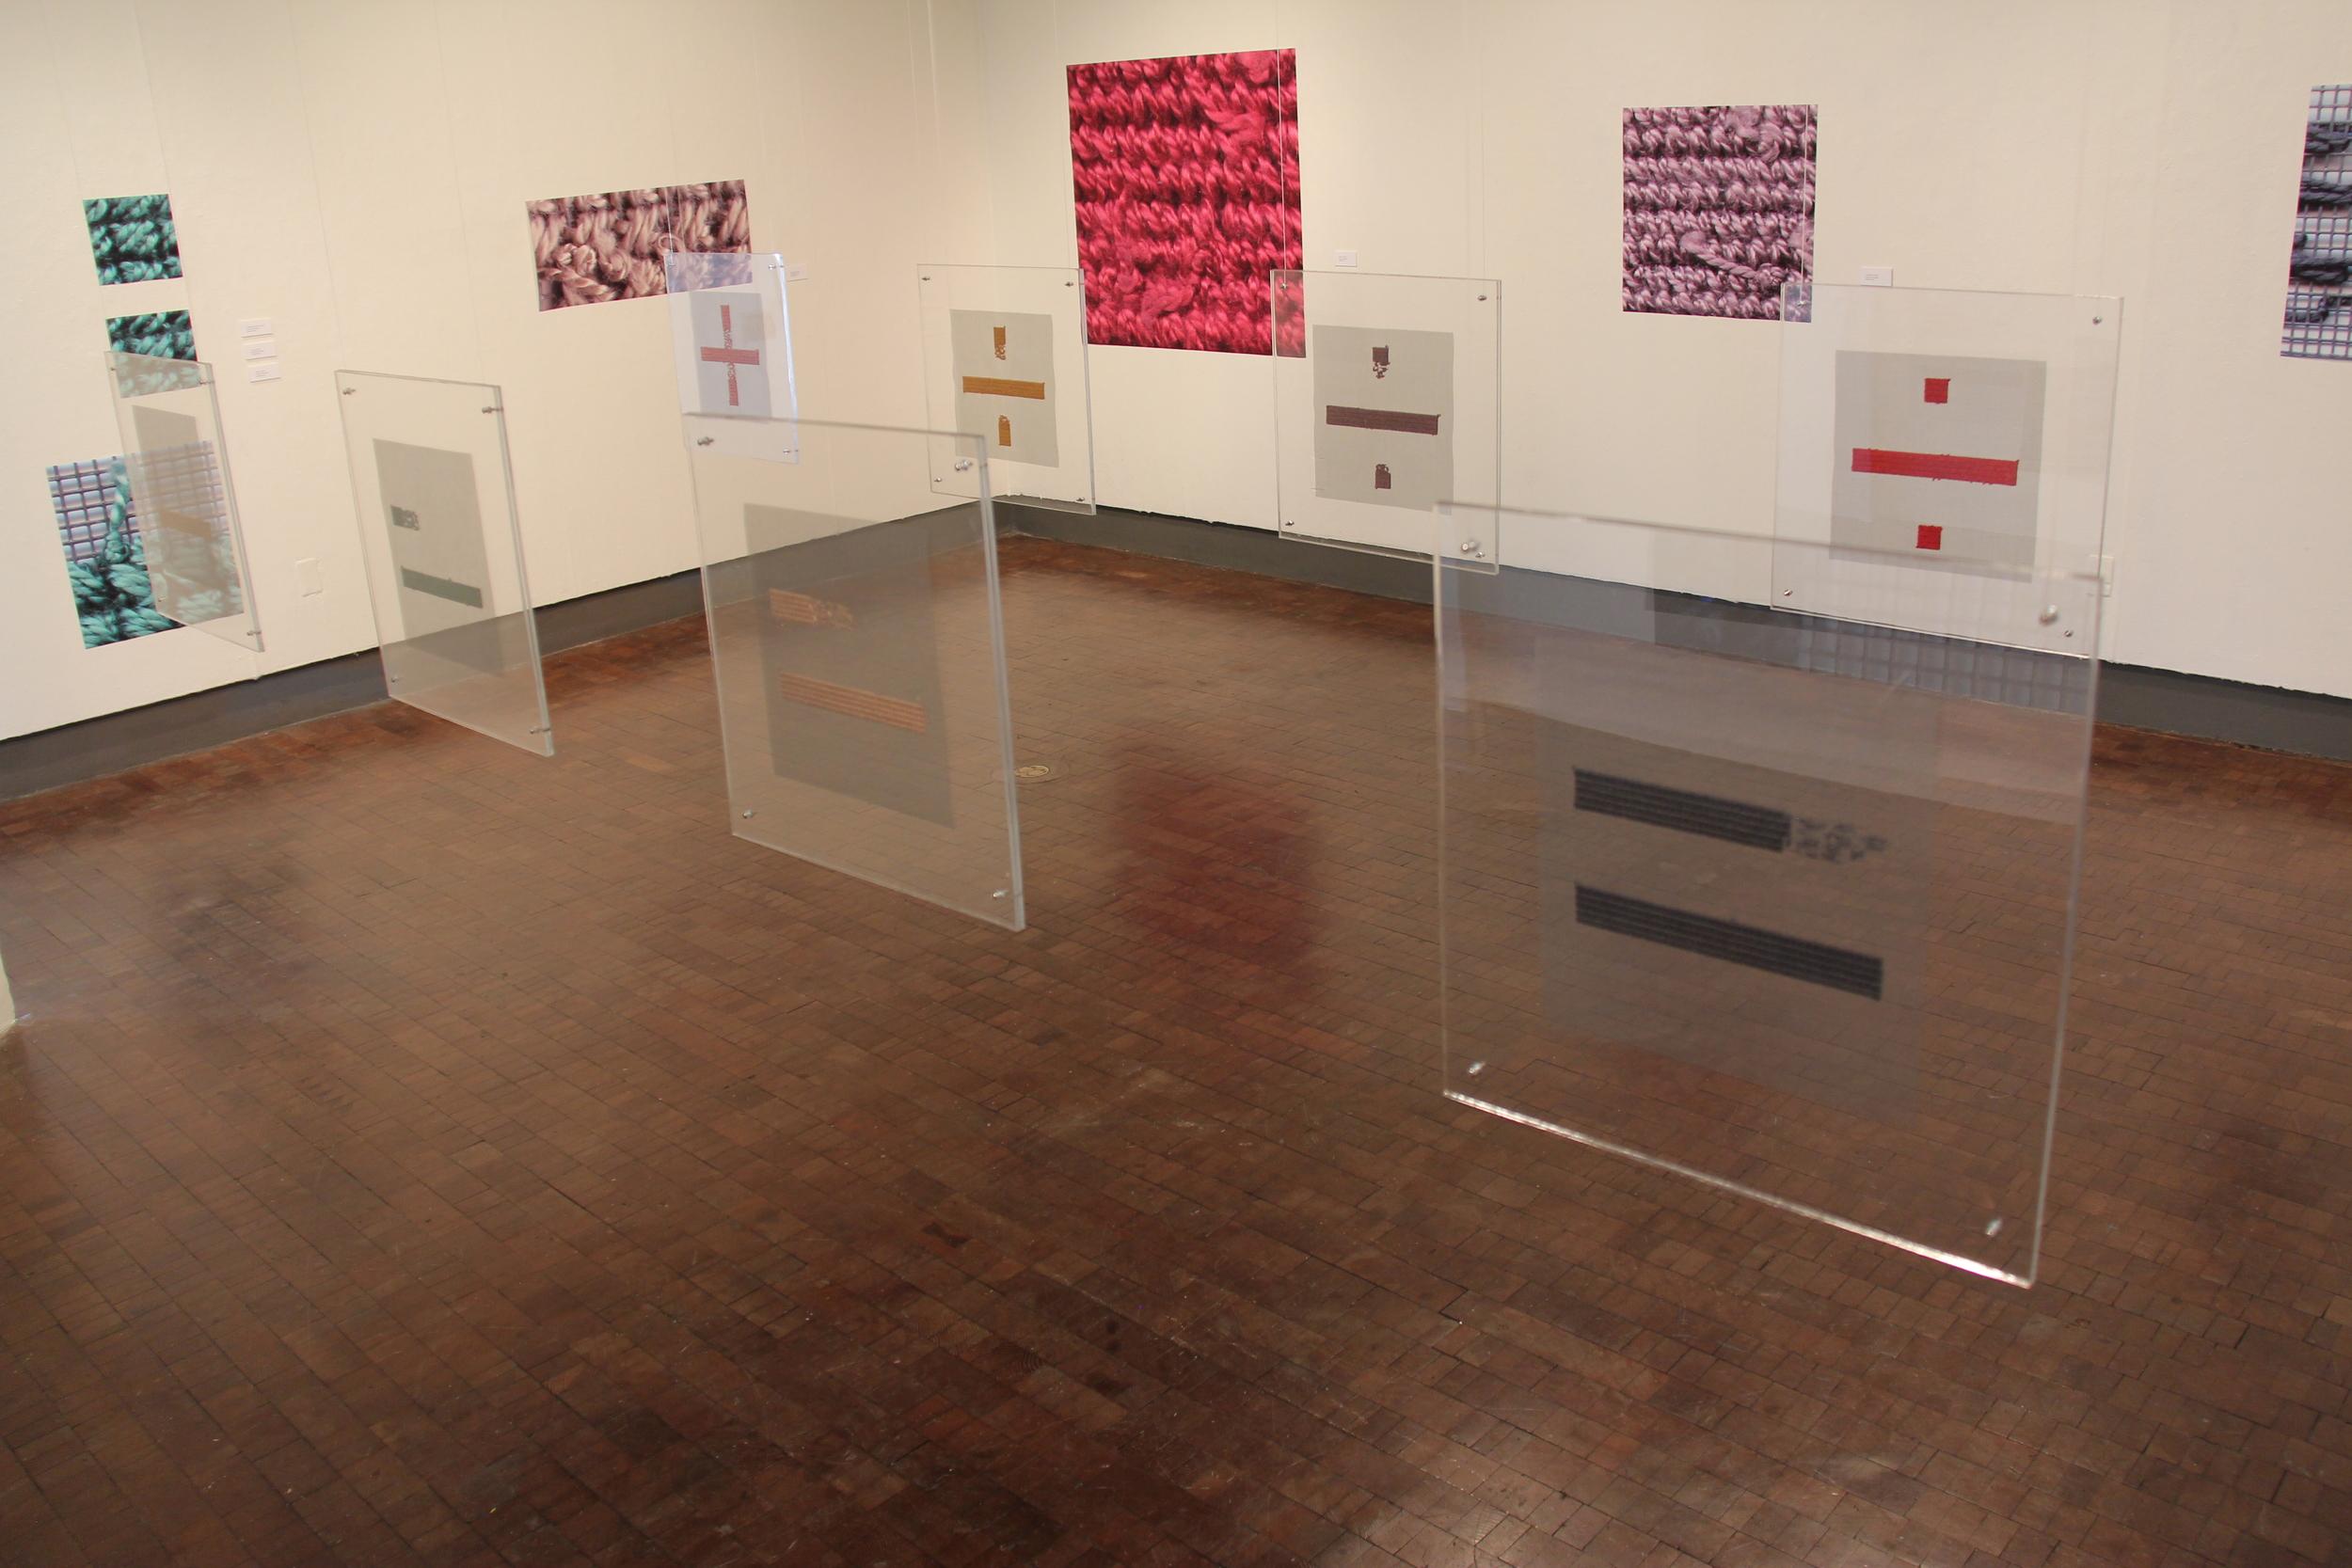 Even-weave Installation, 2014